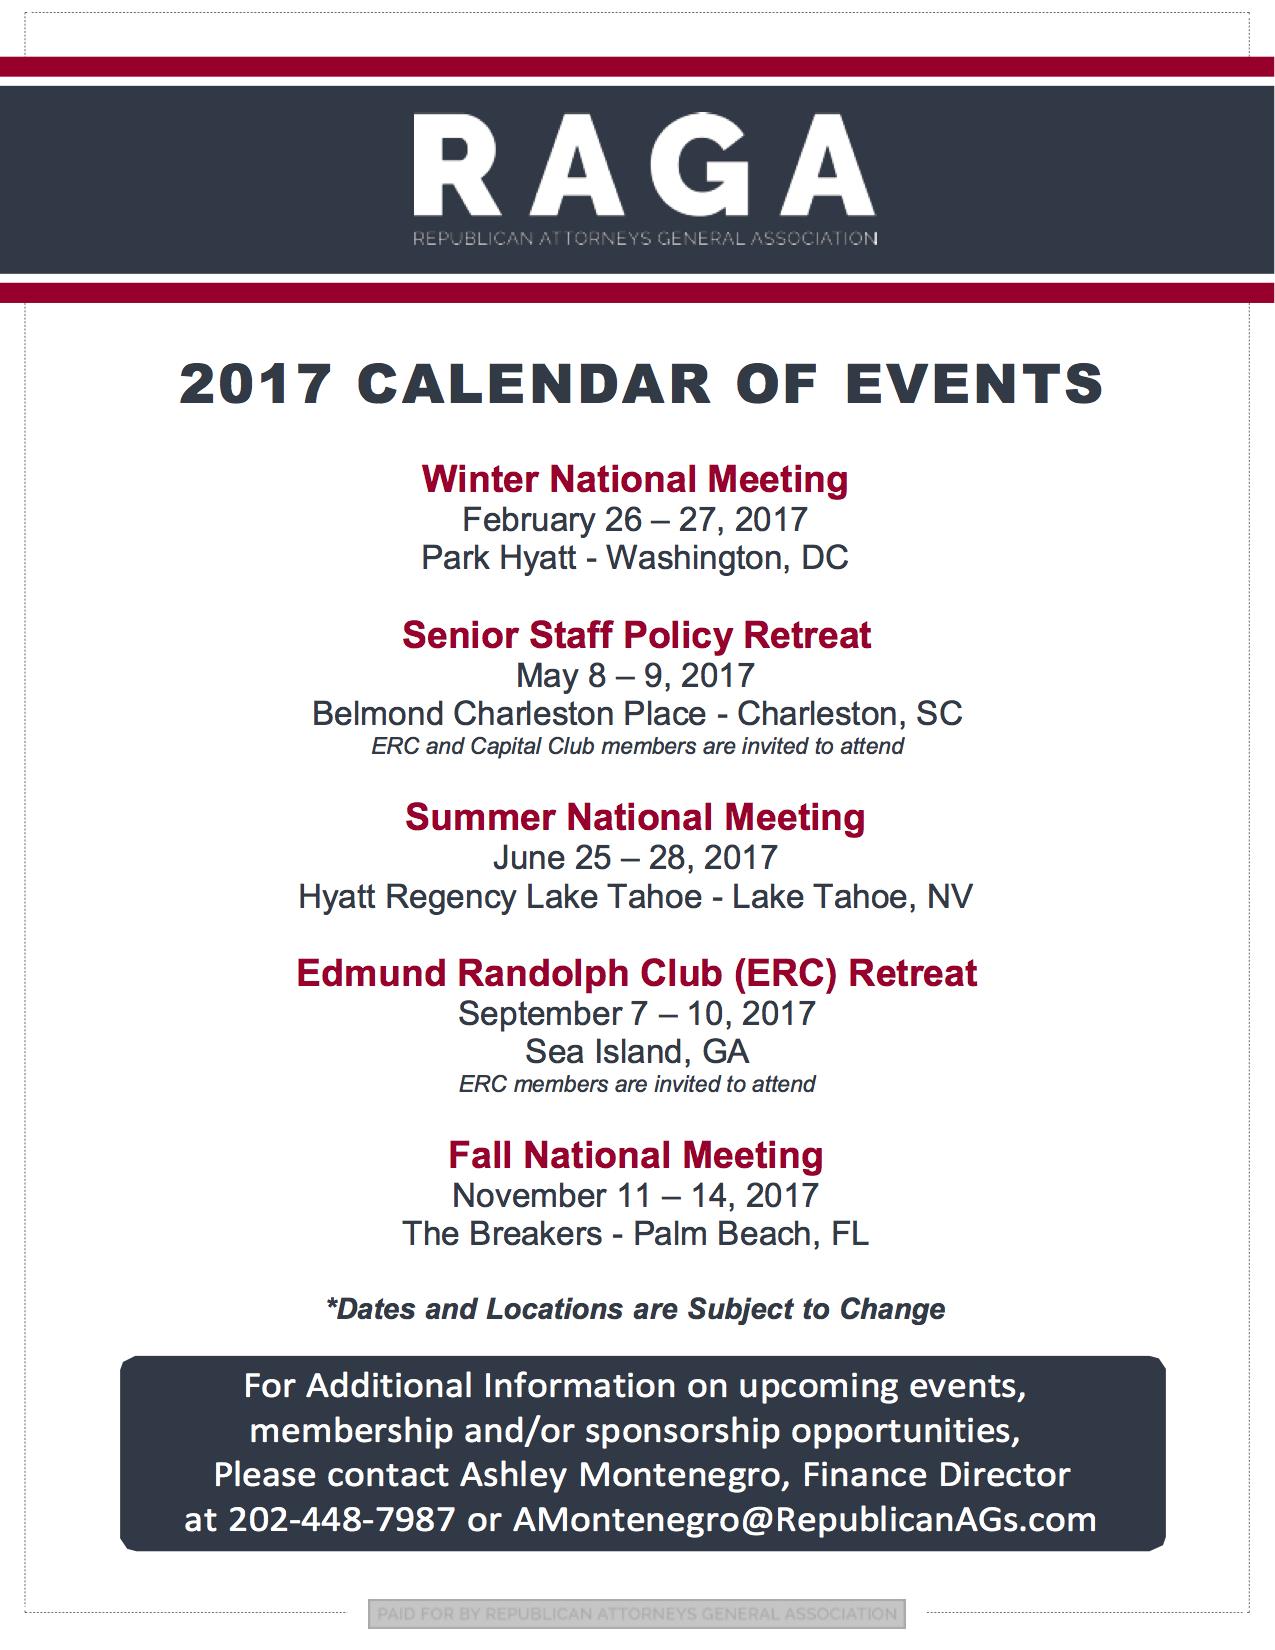 RAGA_2017_Calendar_of_Eventsv2.png